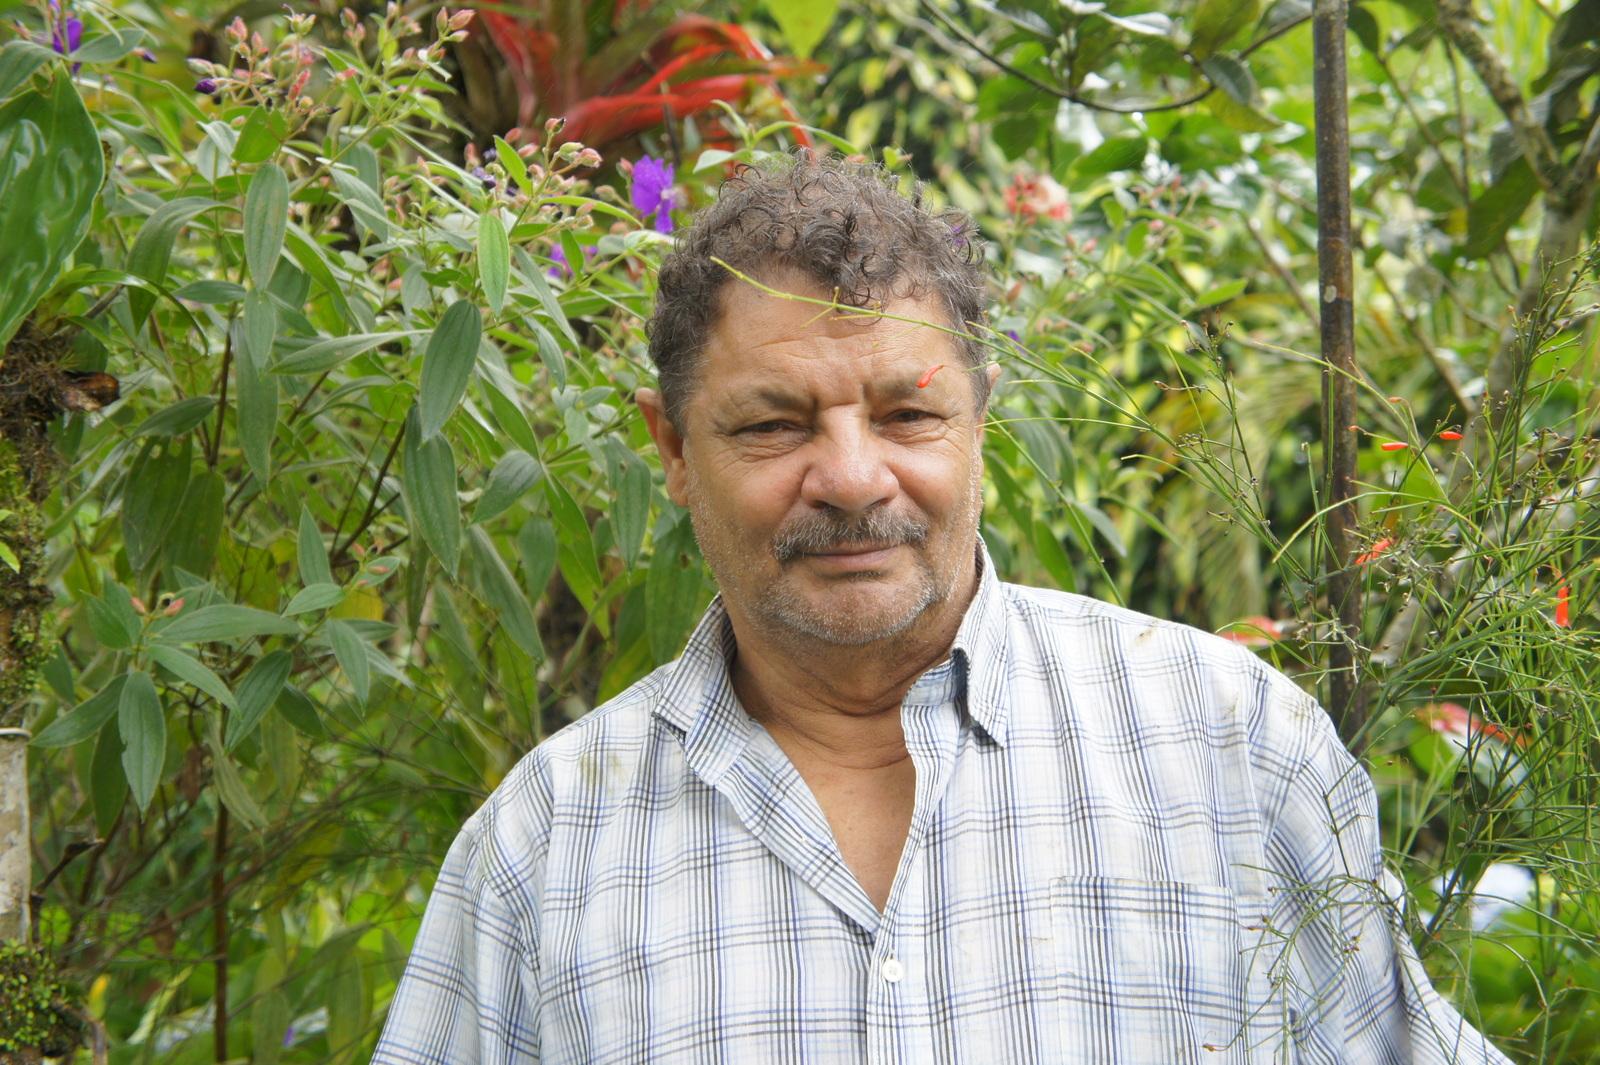 Gabelo Elizondo Zamora